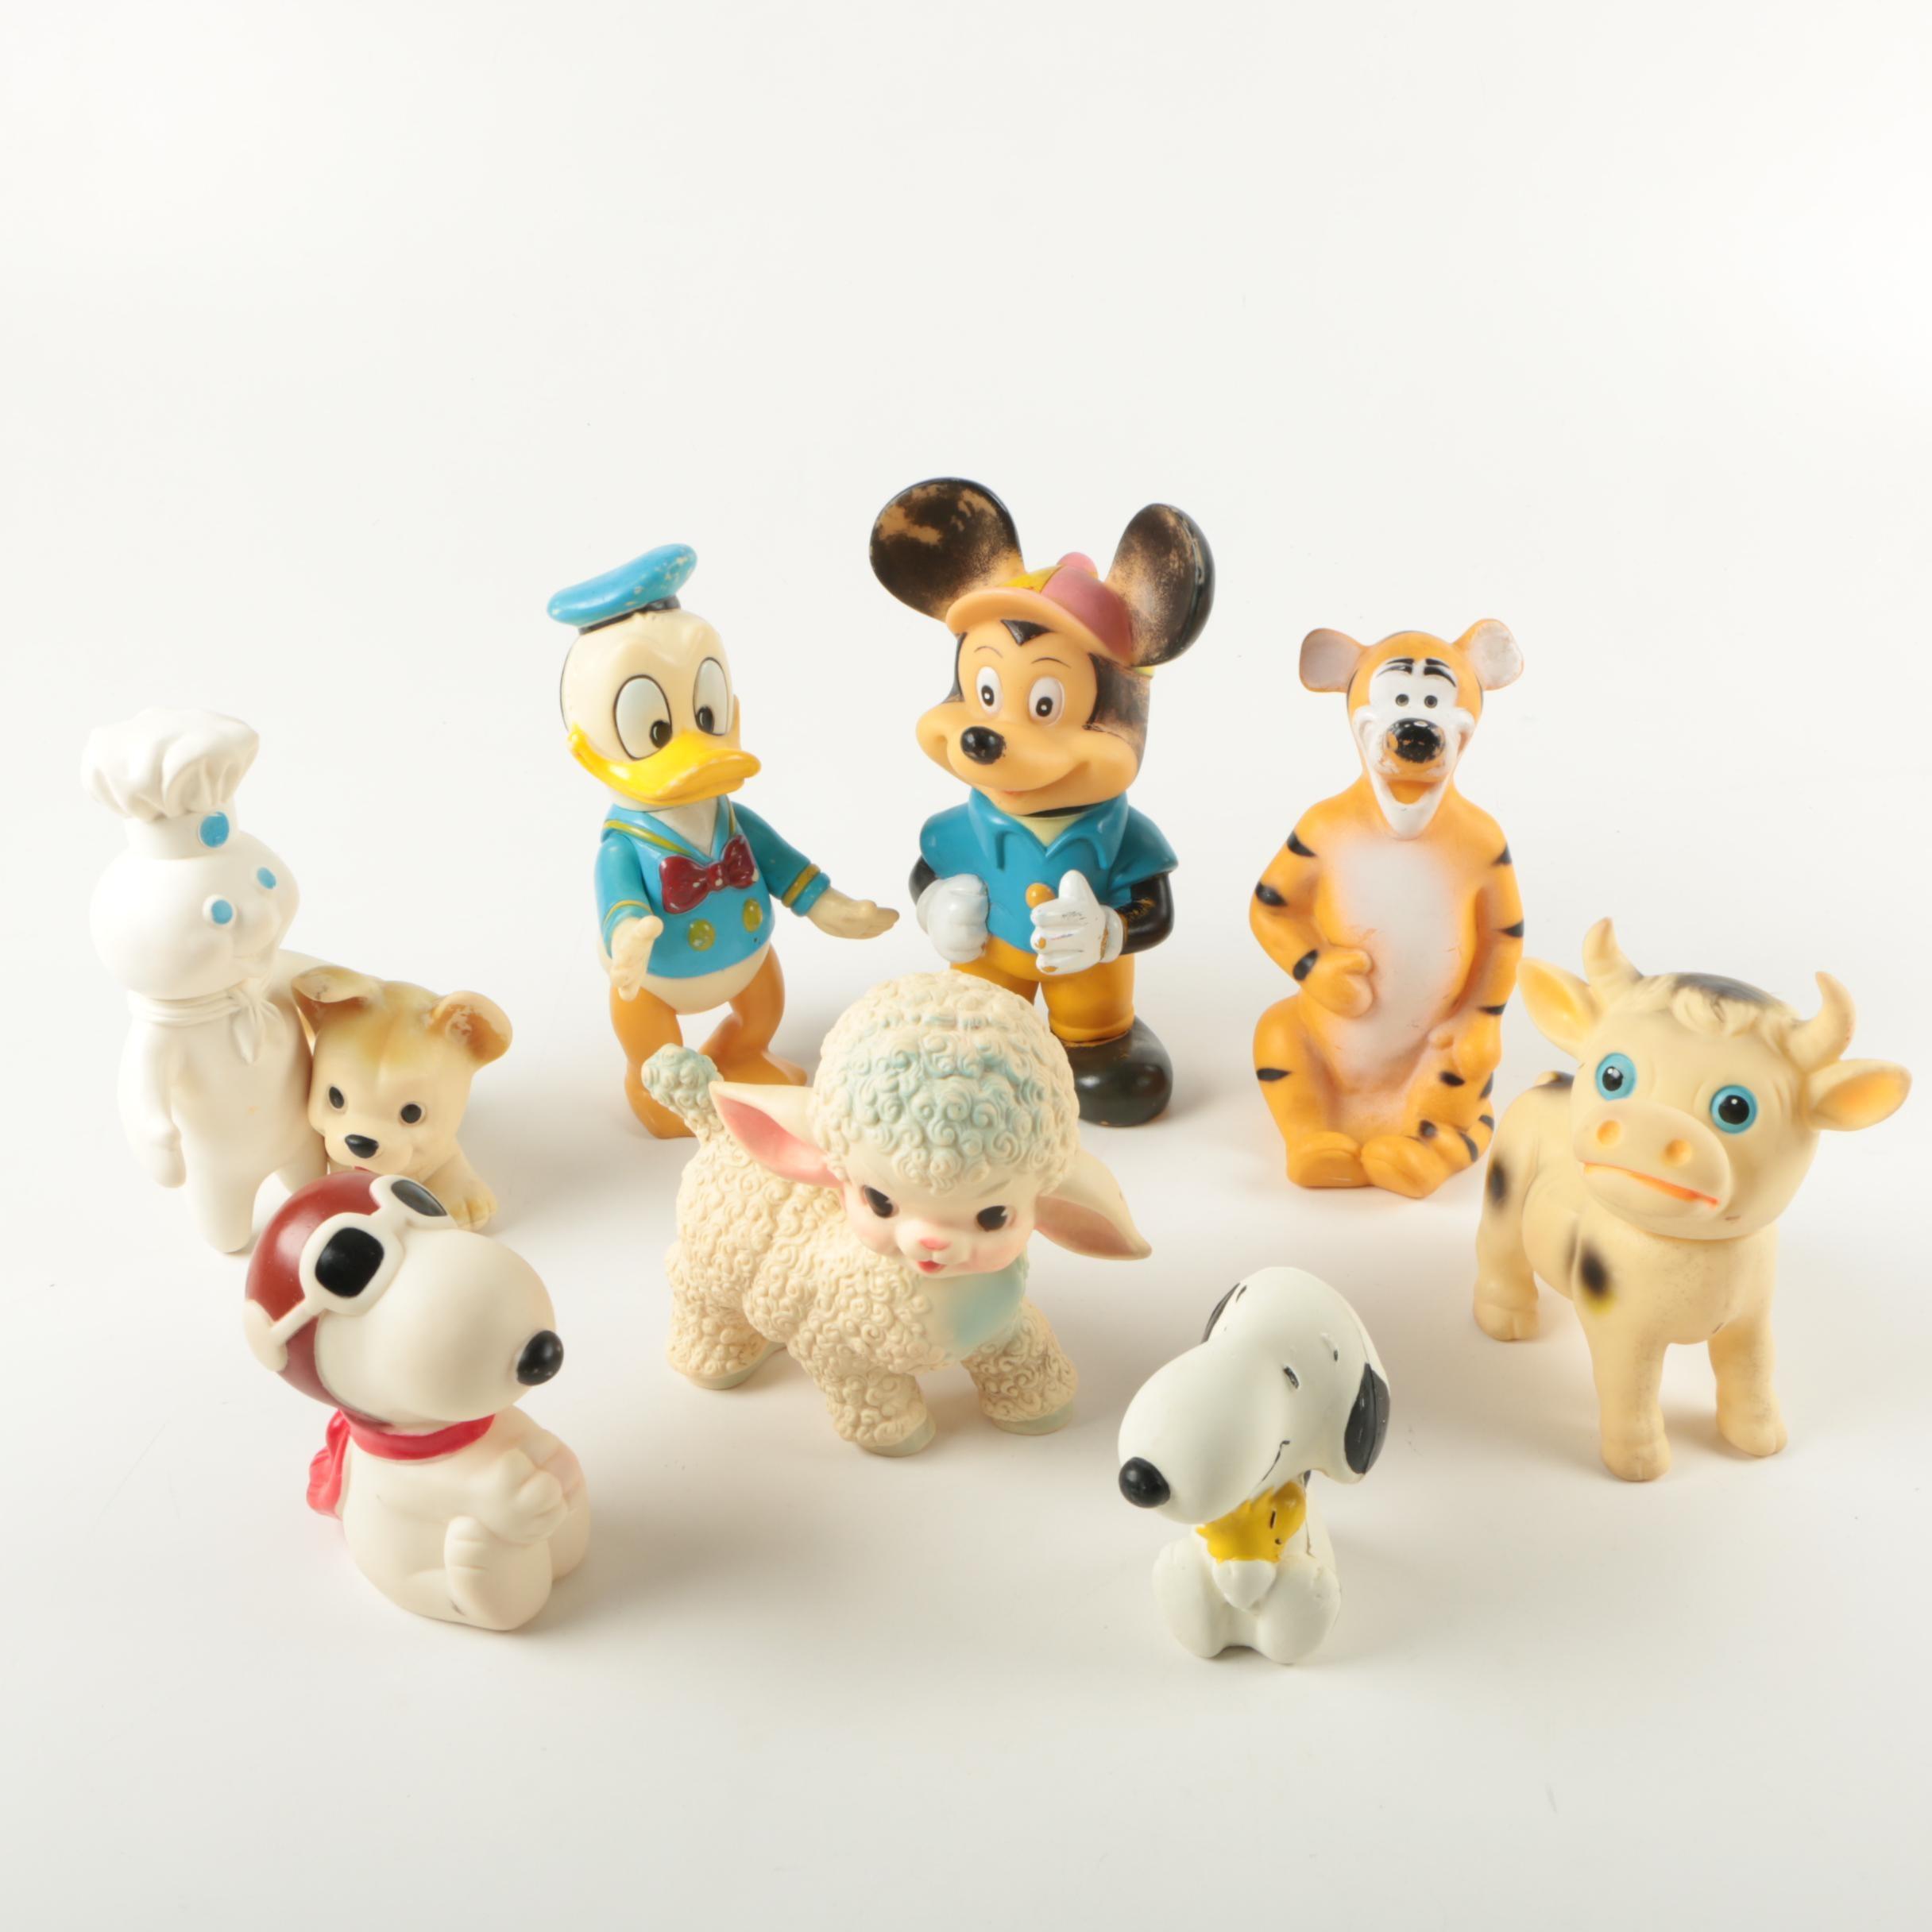 Assorted Rubber Squeak-Toys Featuring Disney